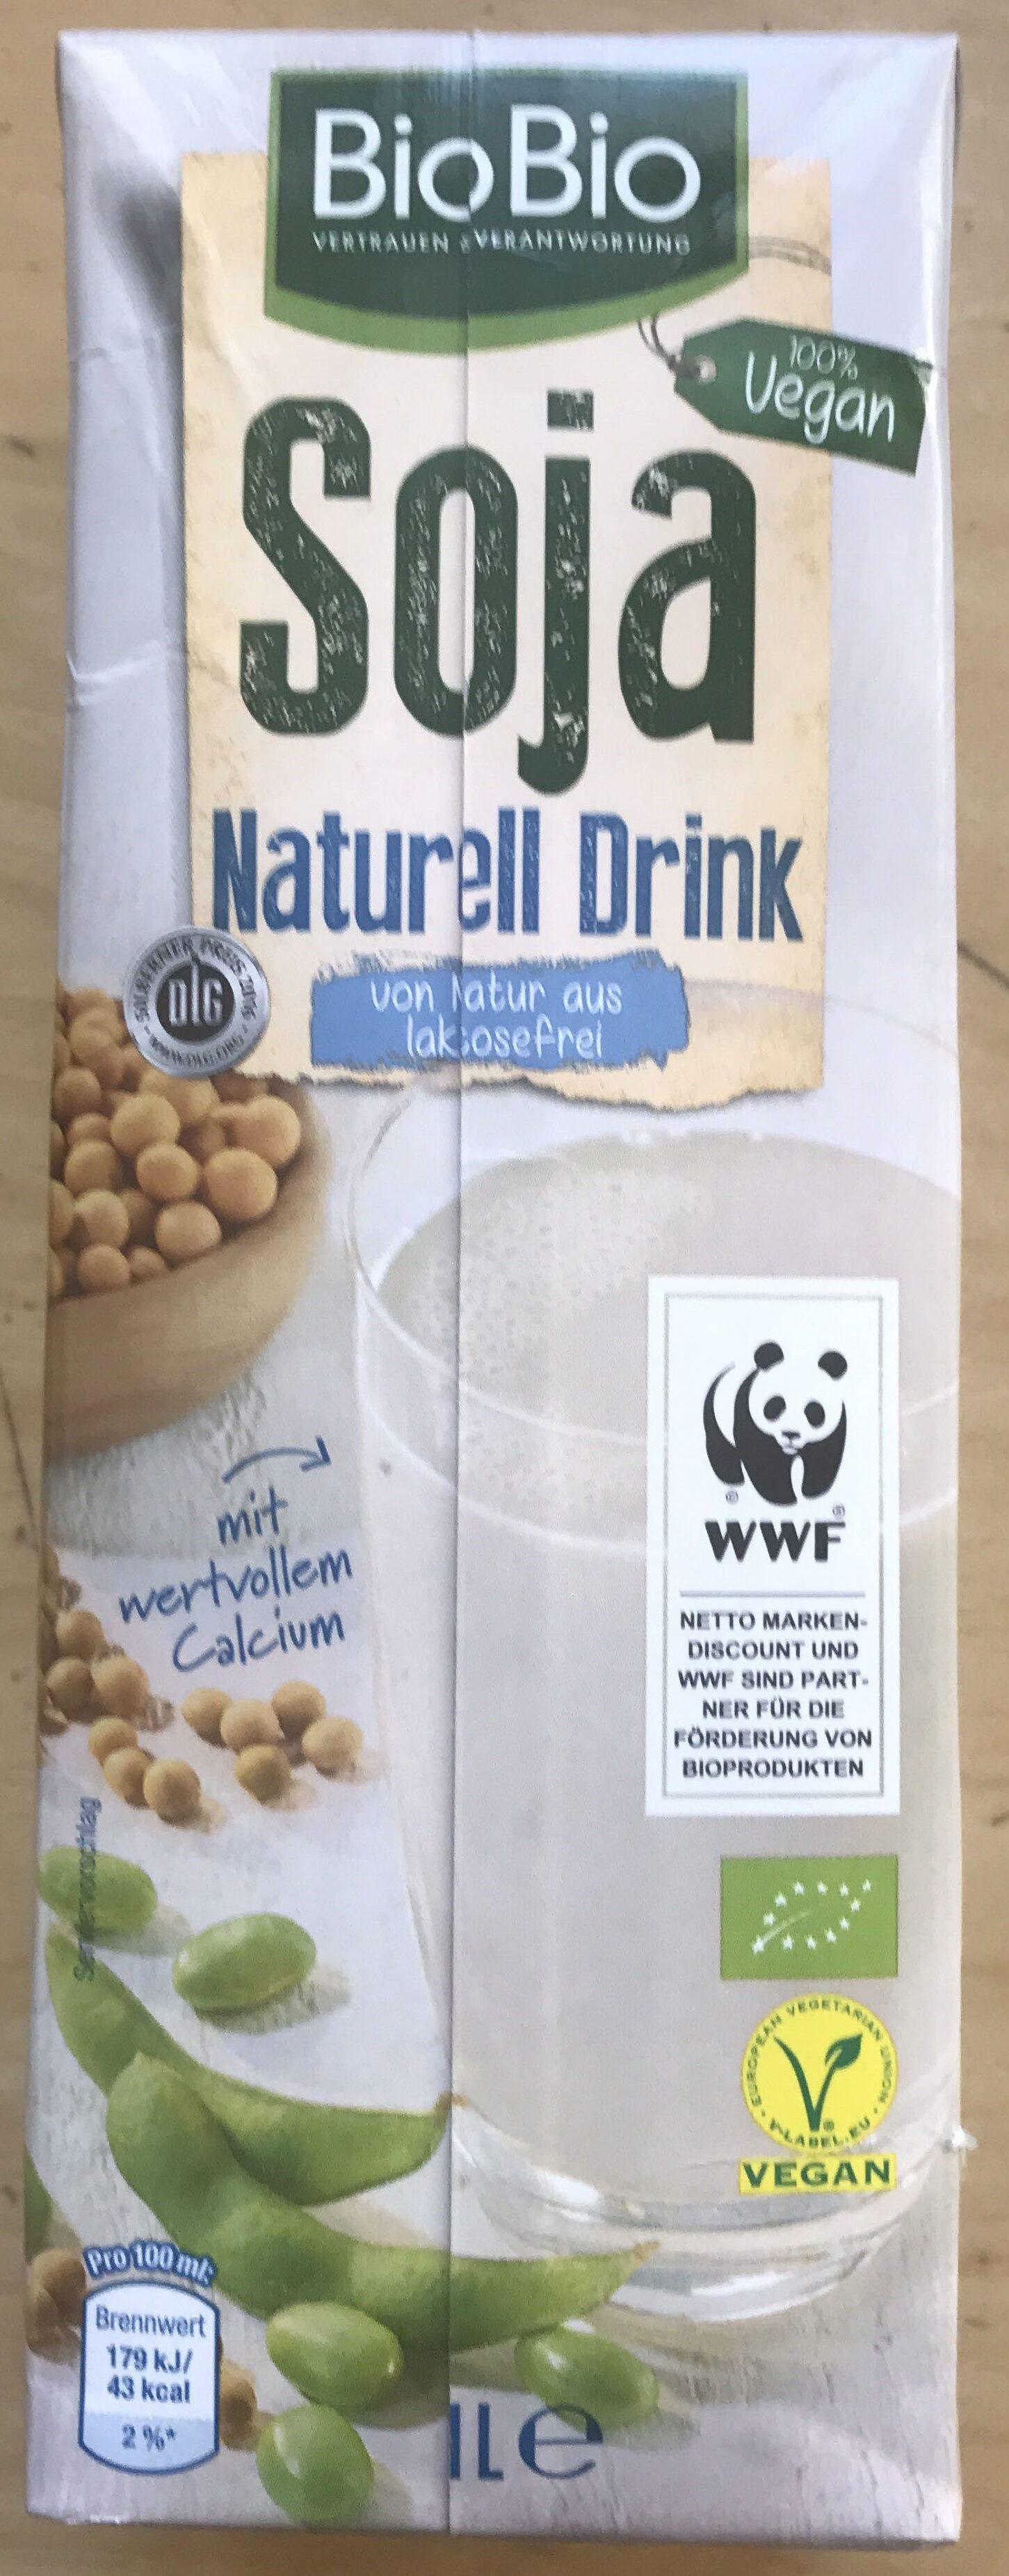 Soja Naturell Drink - Product - de